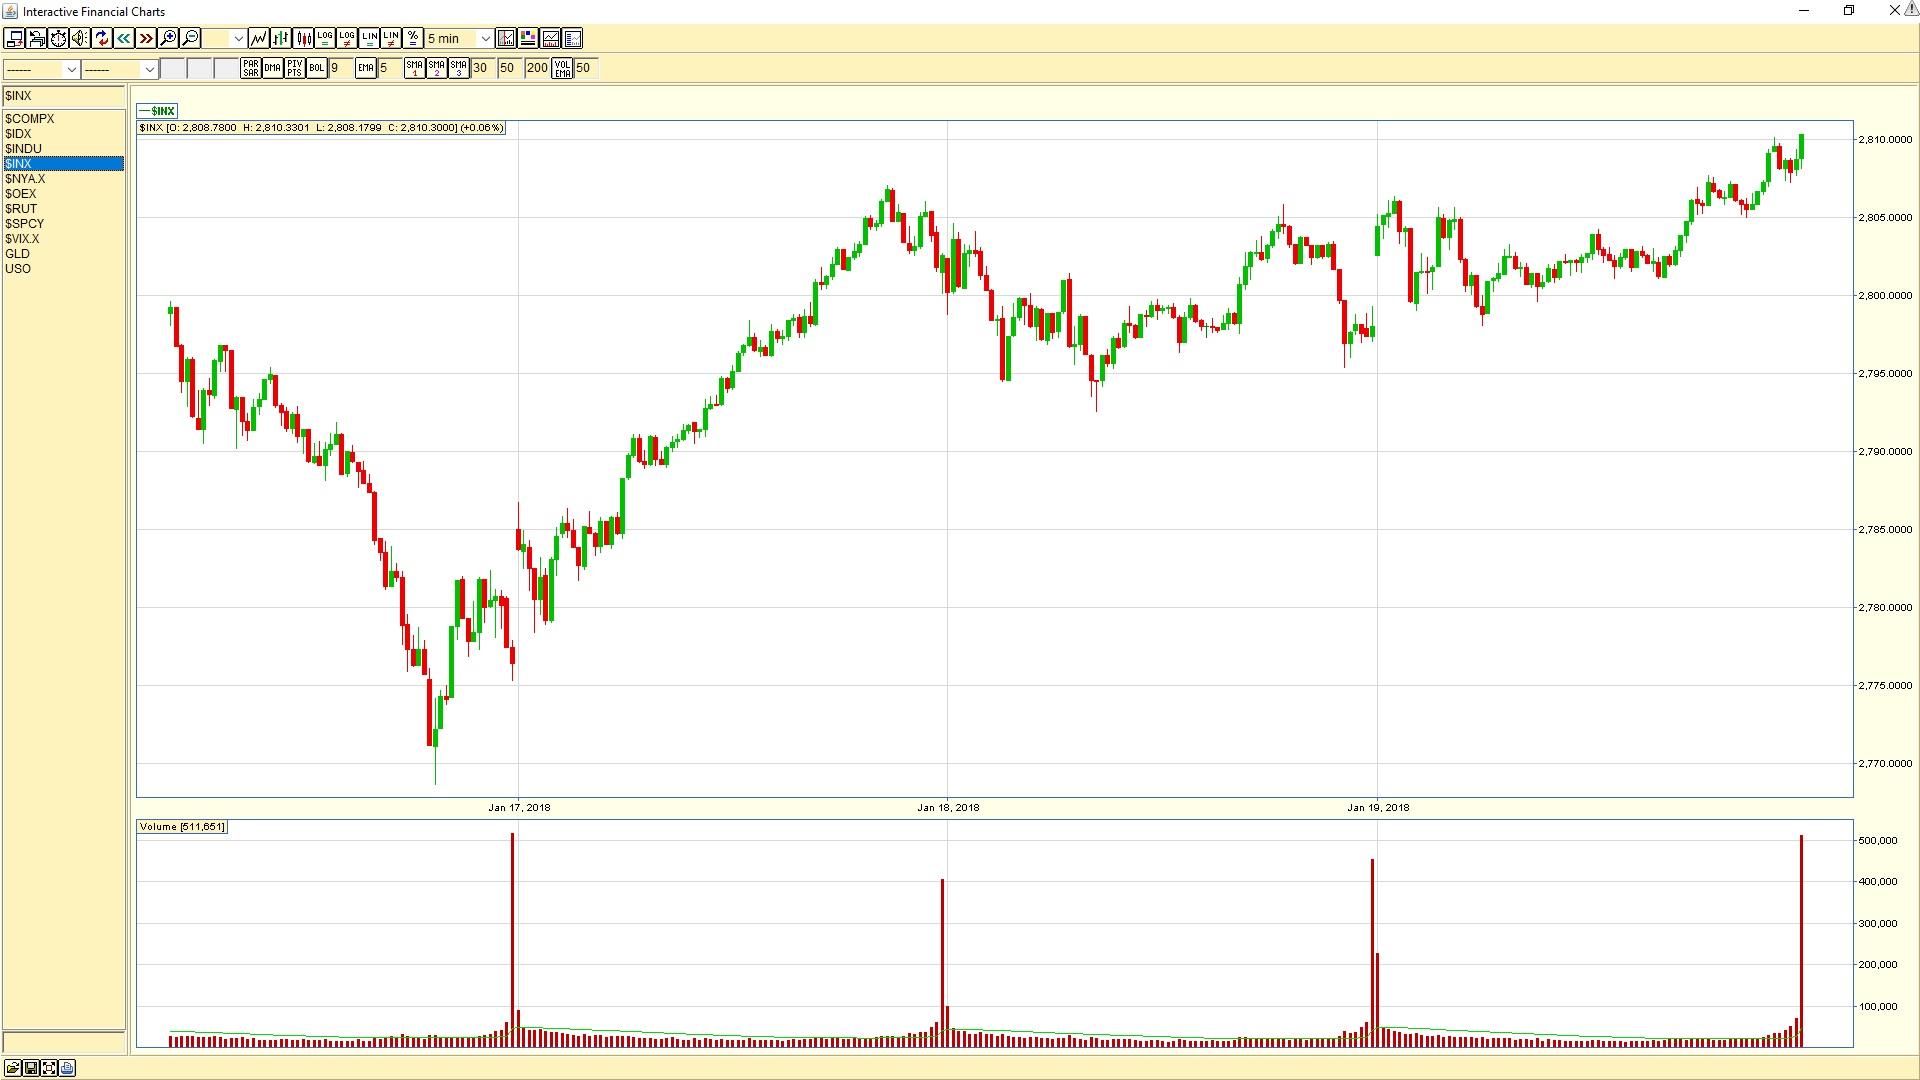 S&P 500 5-min chart 20180119